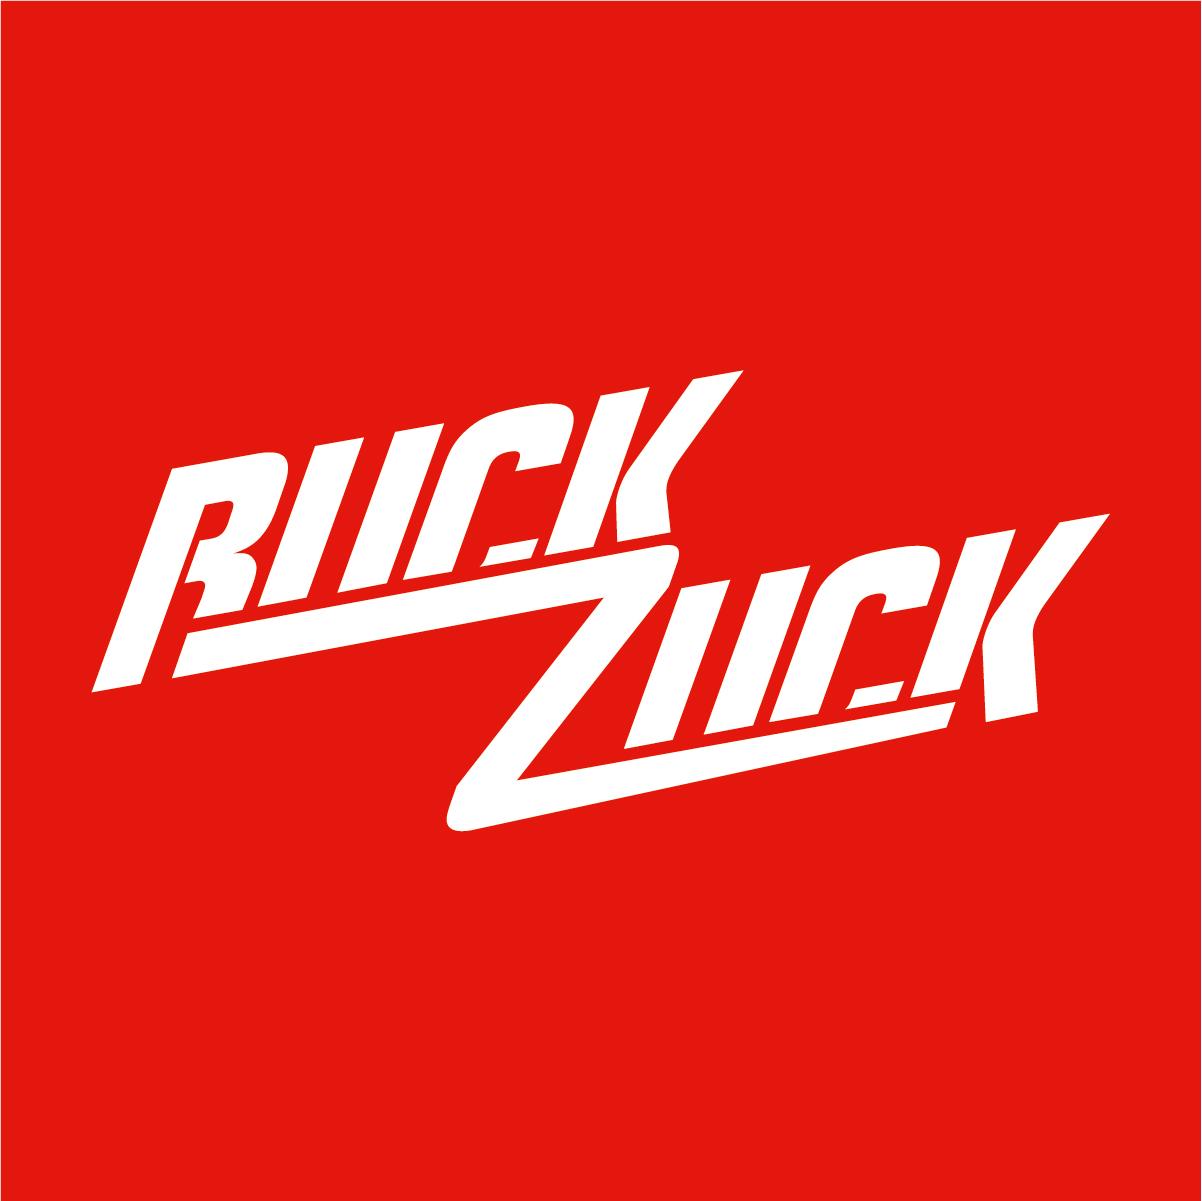 Komplettset Sono Pro Landscape Designboden 4,5mm Nordic Shore